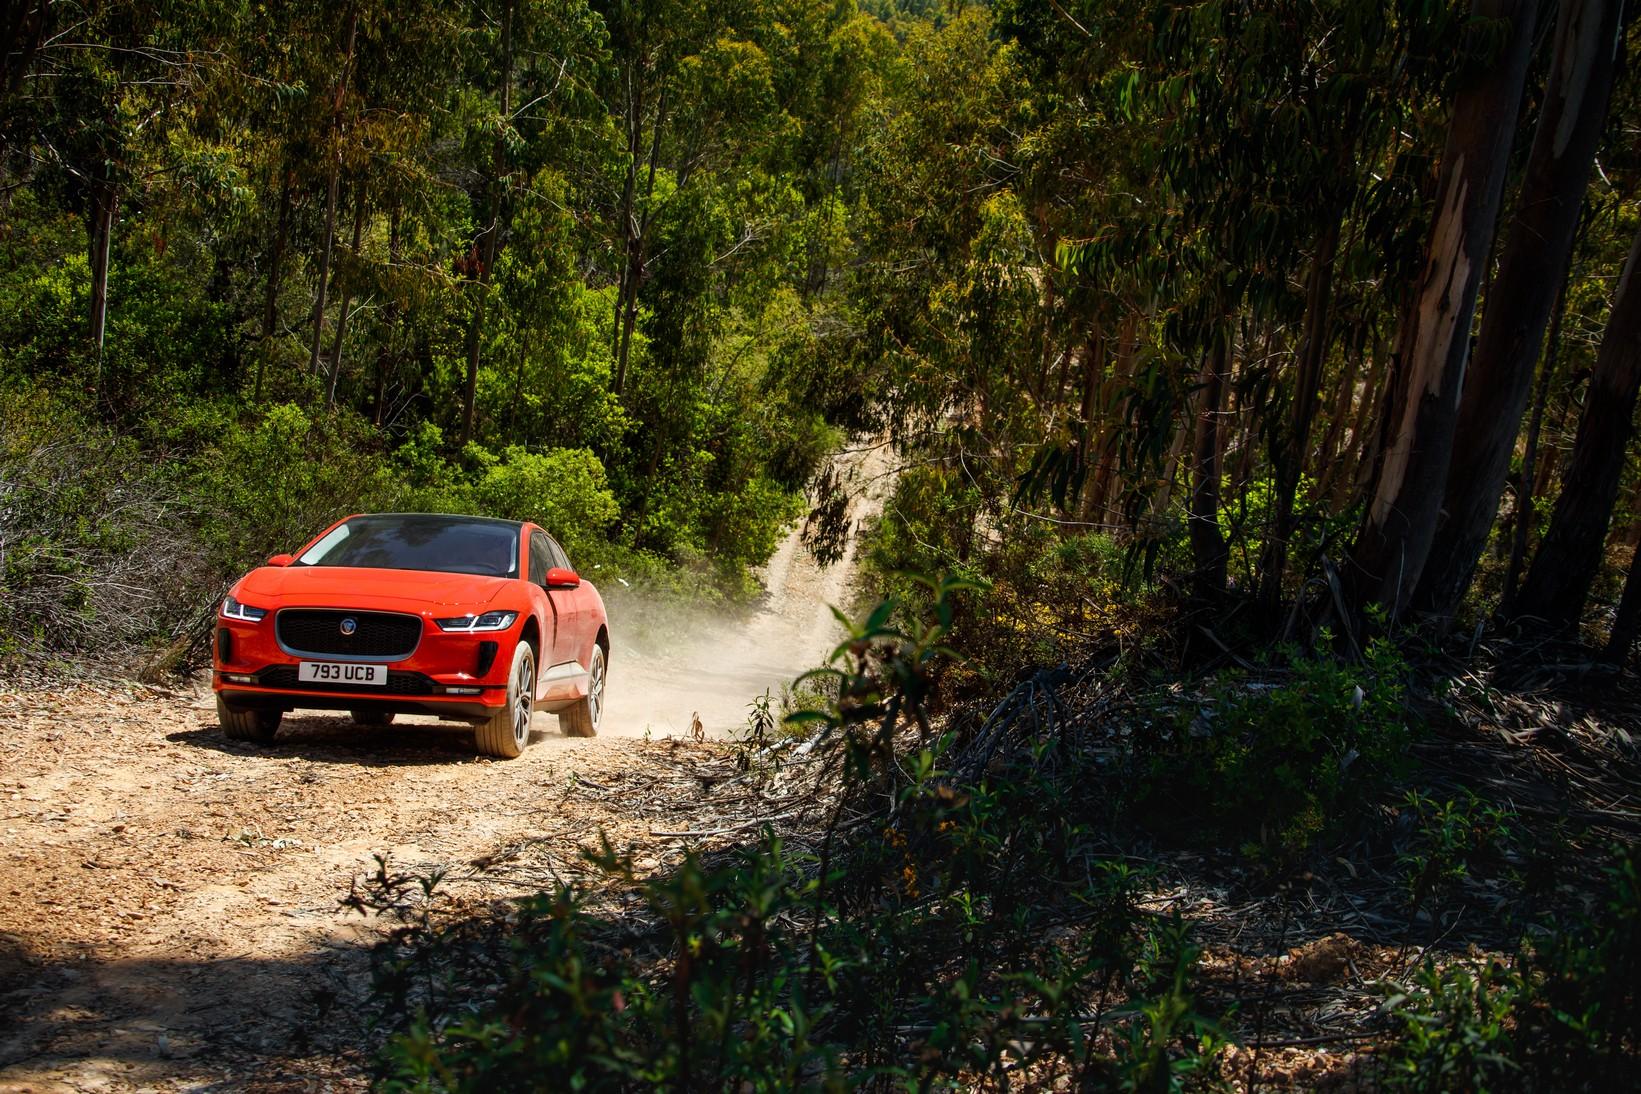 Jaguar I-PACE 90kWh EV400 S image 14